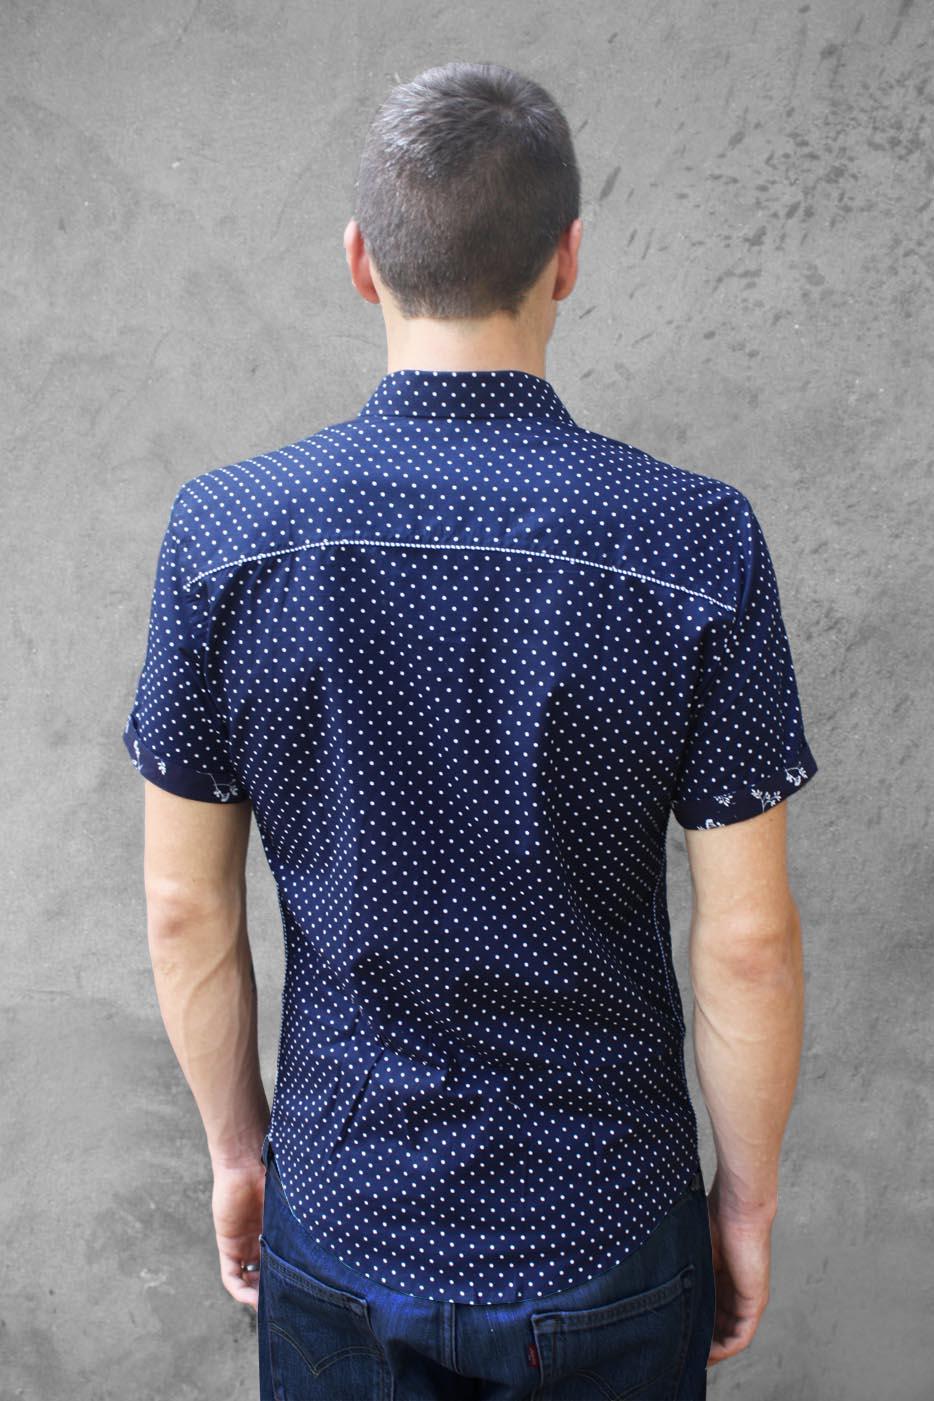 ee1b352546 Baïsap - Camisa de lunares